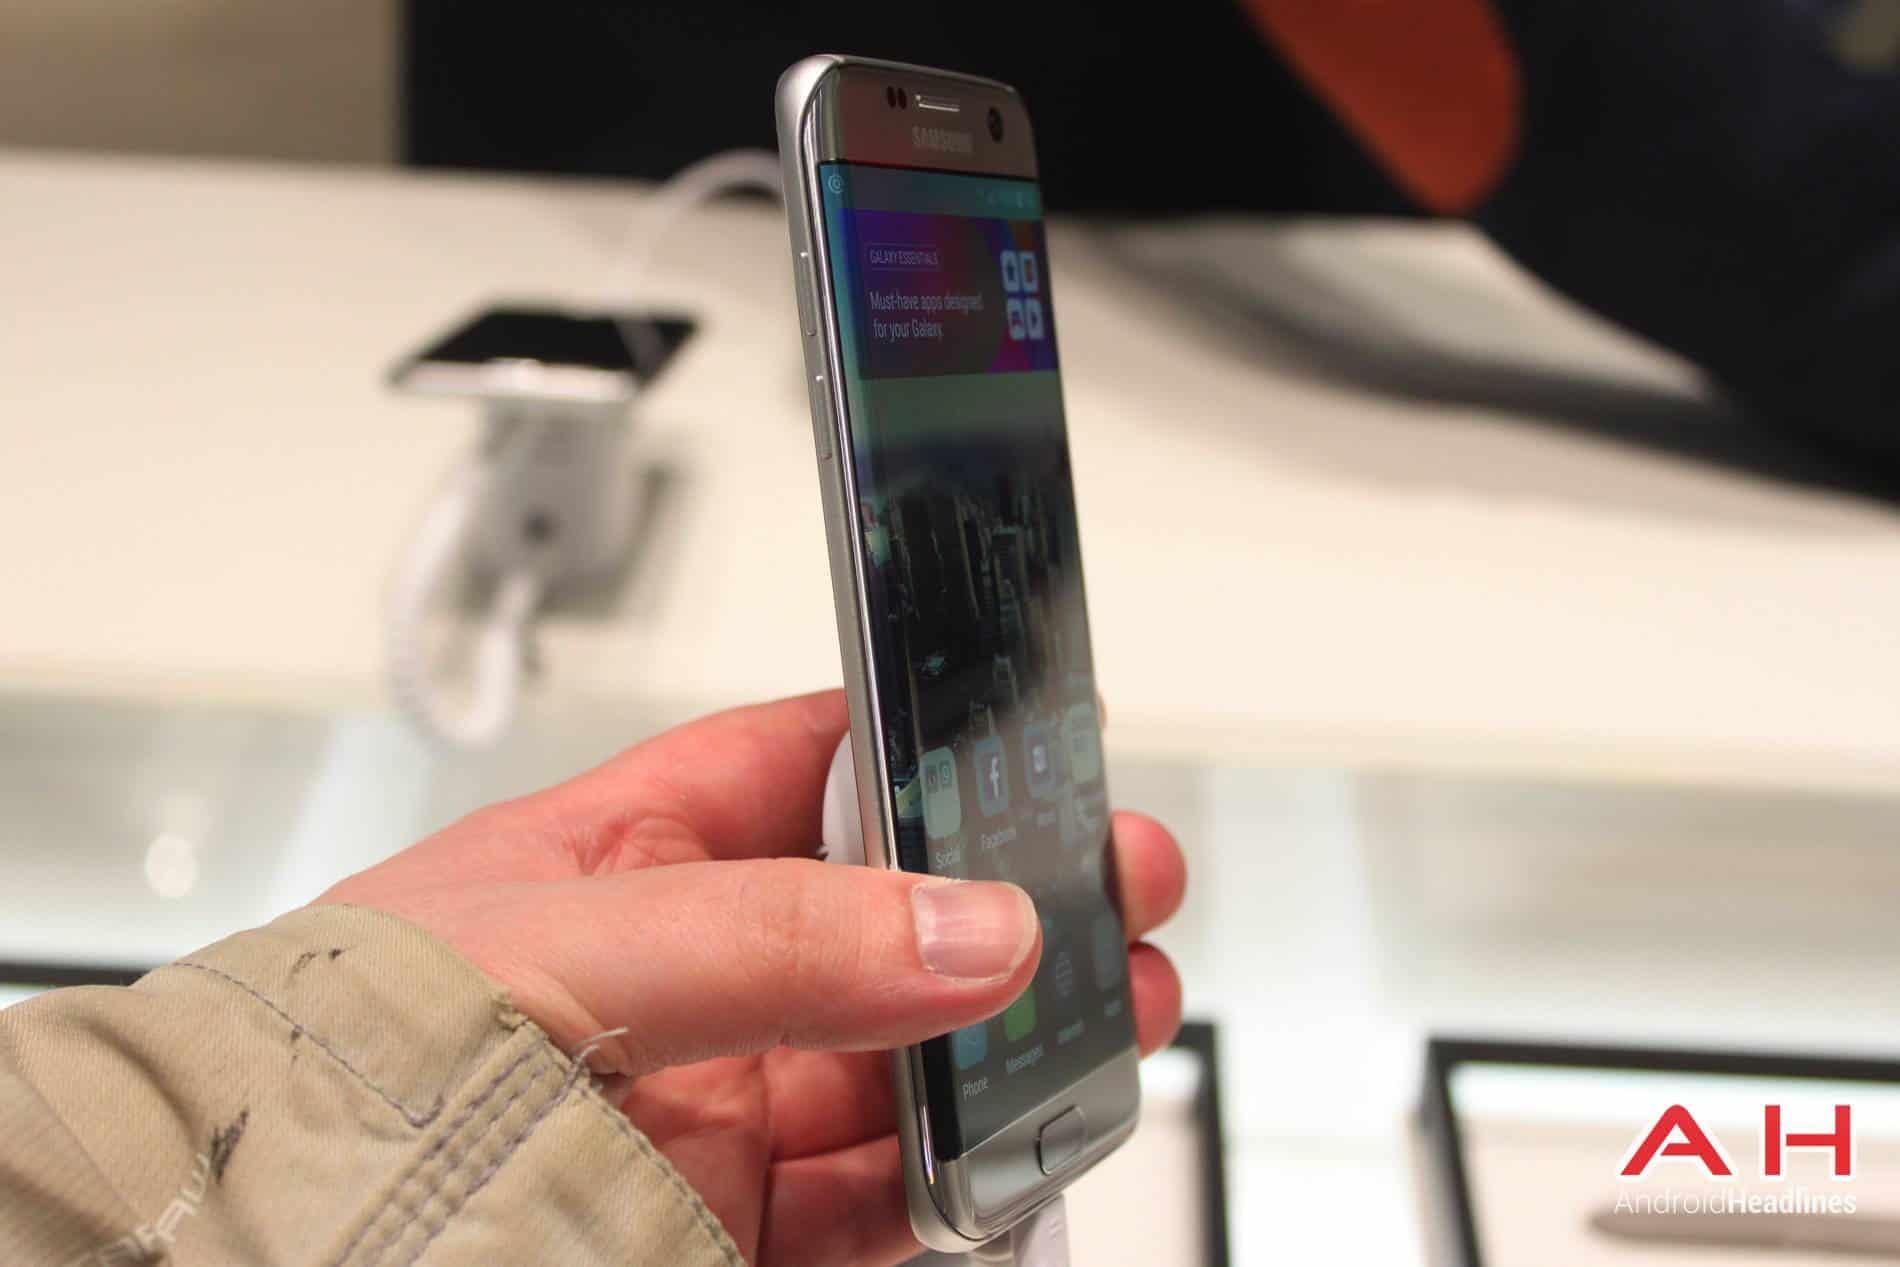 Galaxy S7 Edge MWC Booth AH 4